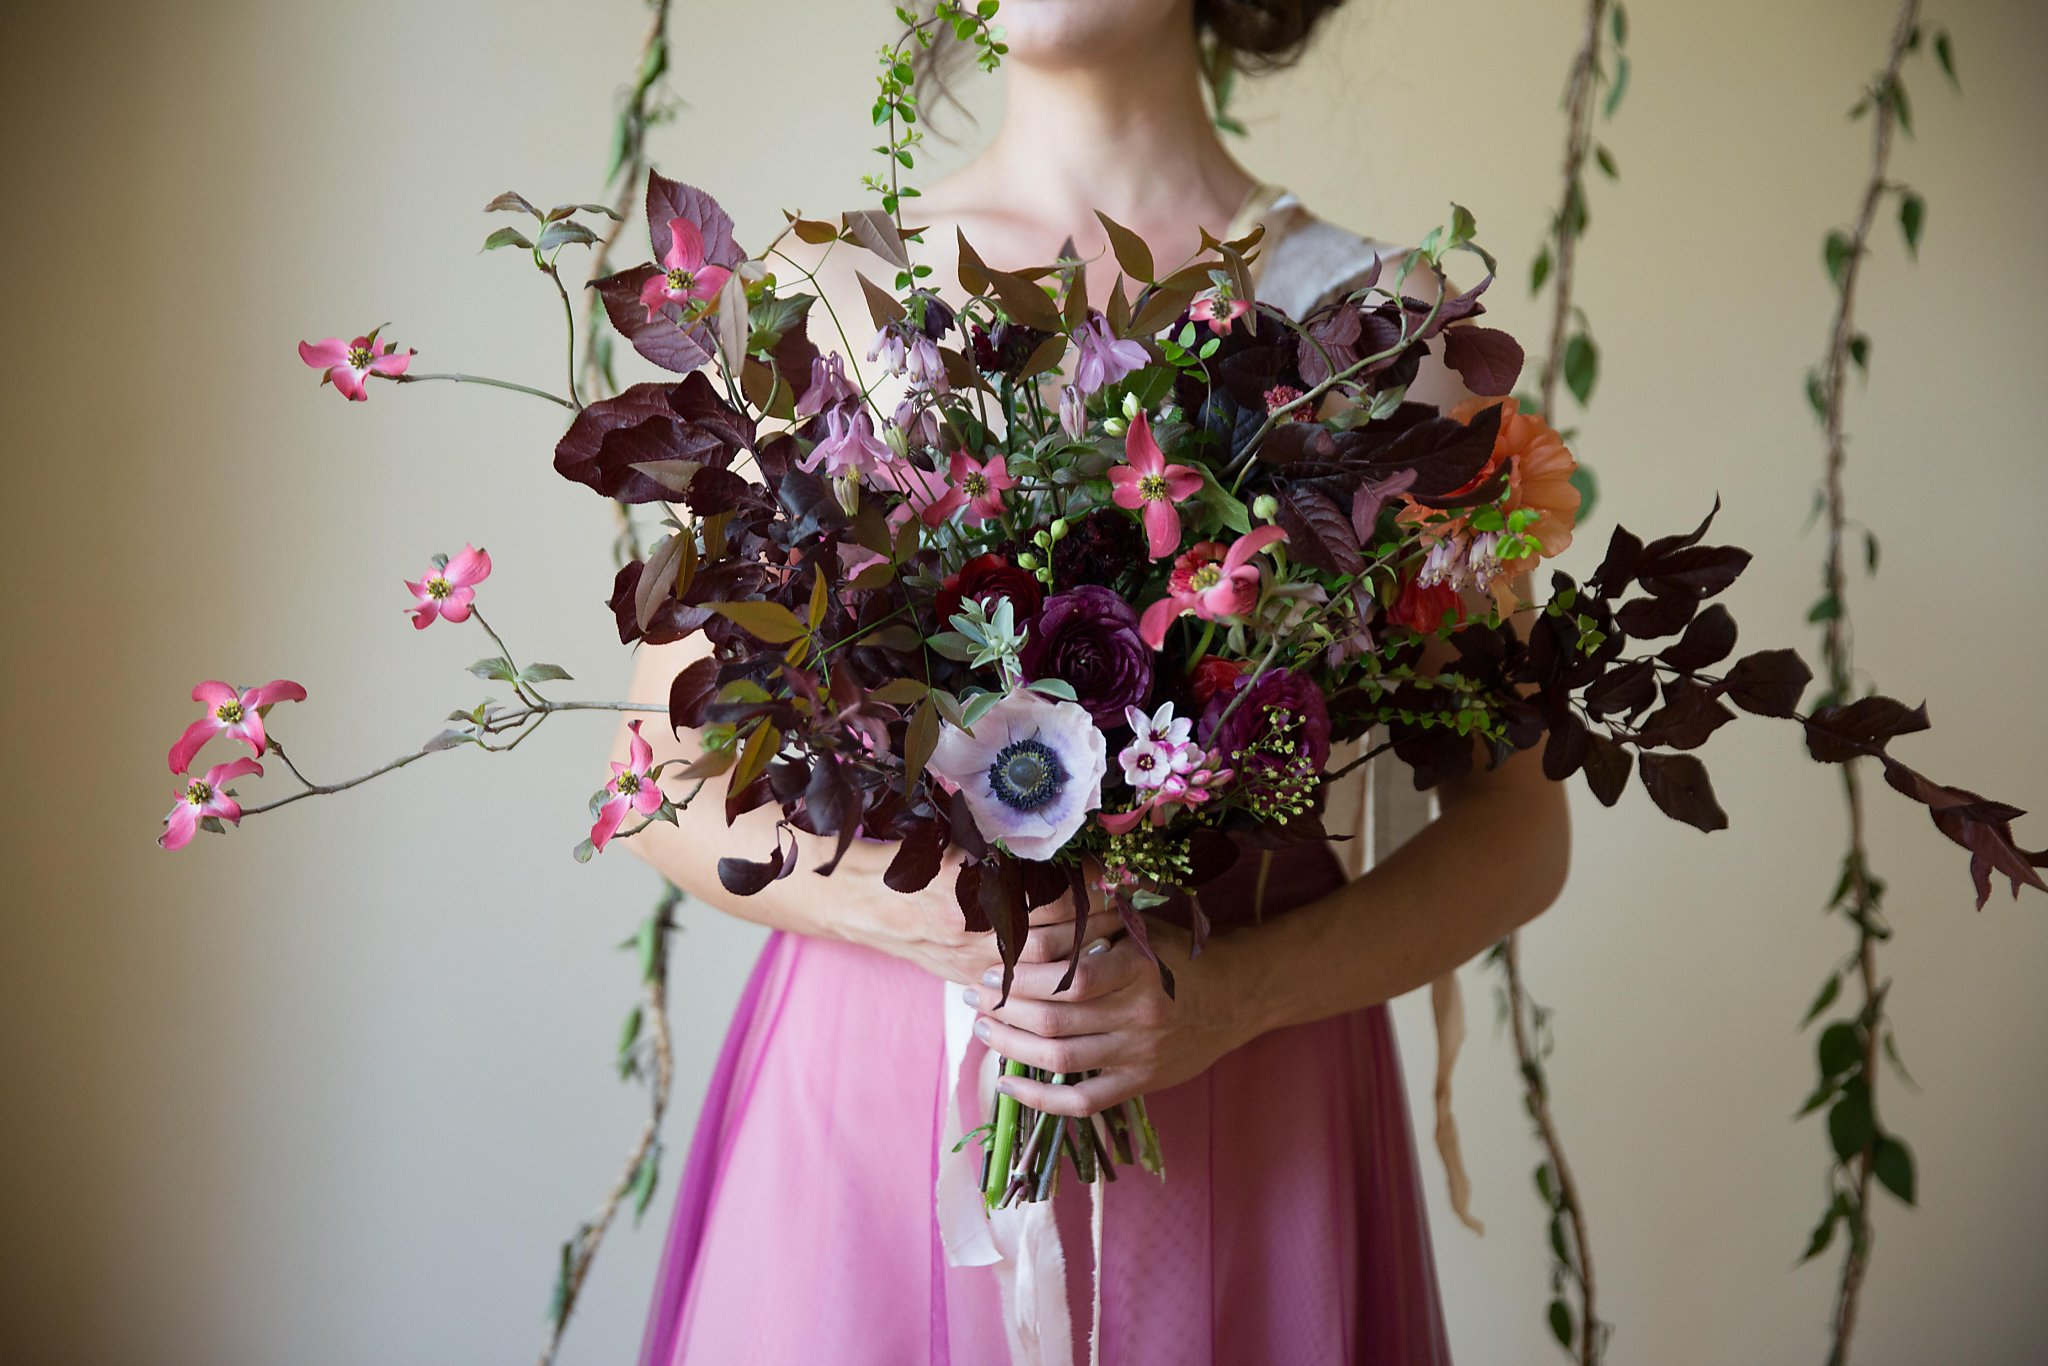 Seasonal sonoma county blooms inspire bridal business sfchronicle izmirmasajfo